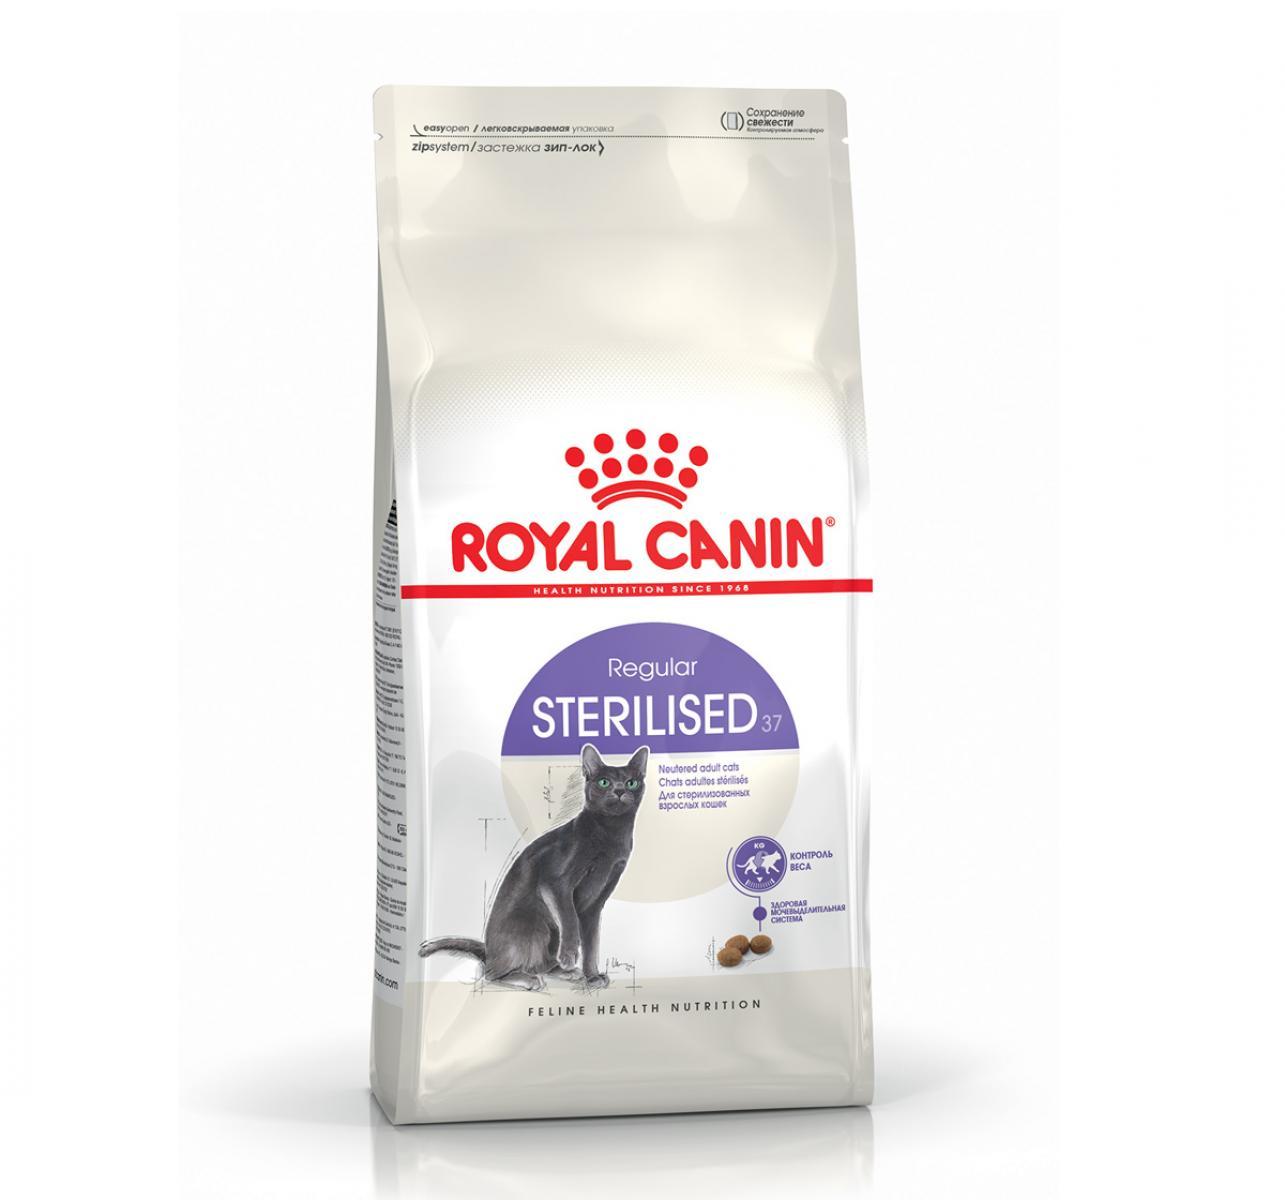 Royal Canin Sterilised Cat Food - 2Kg